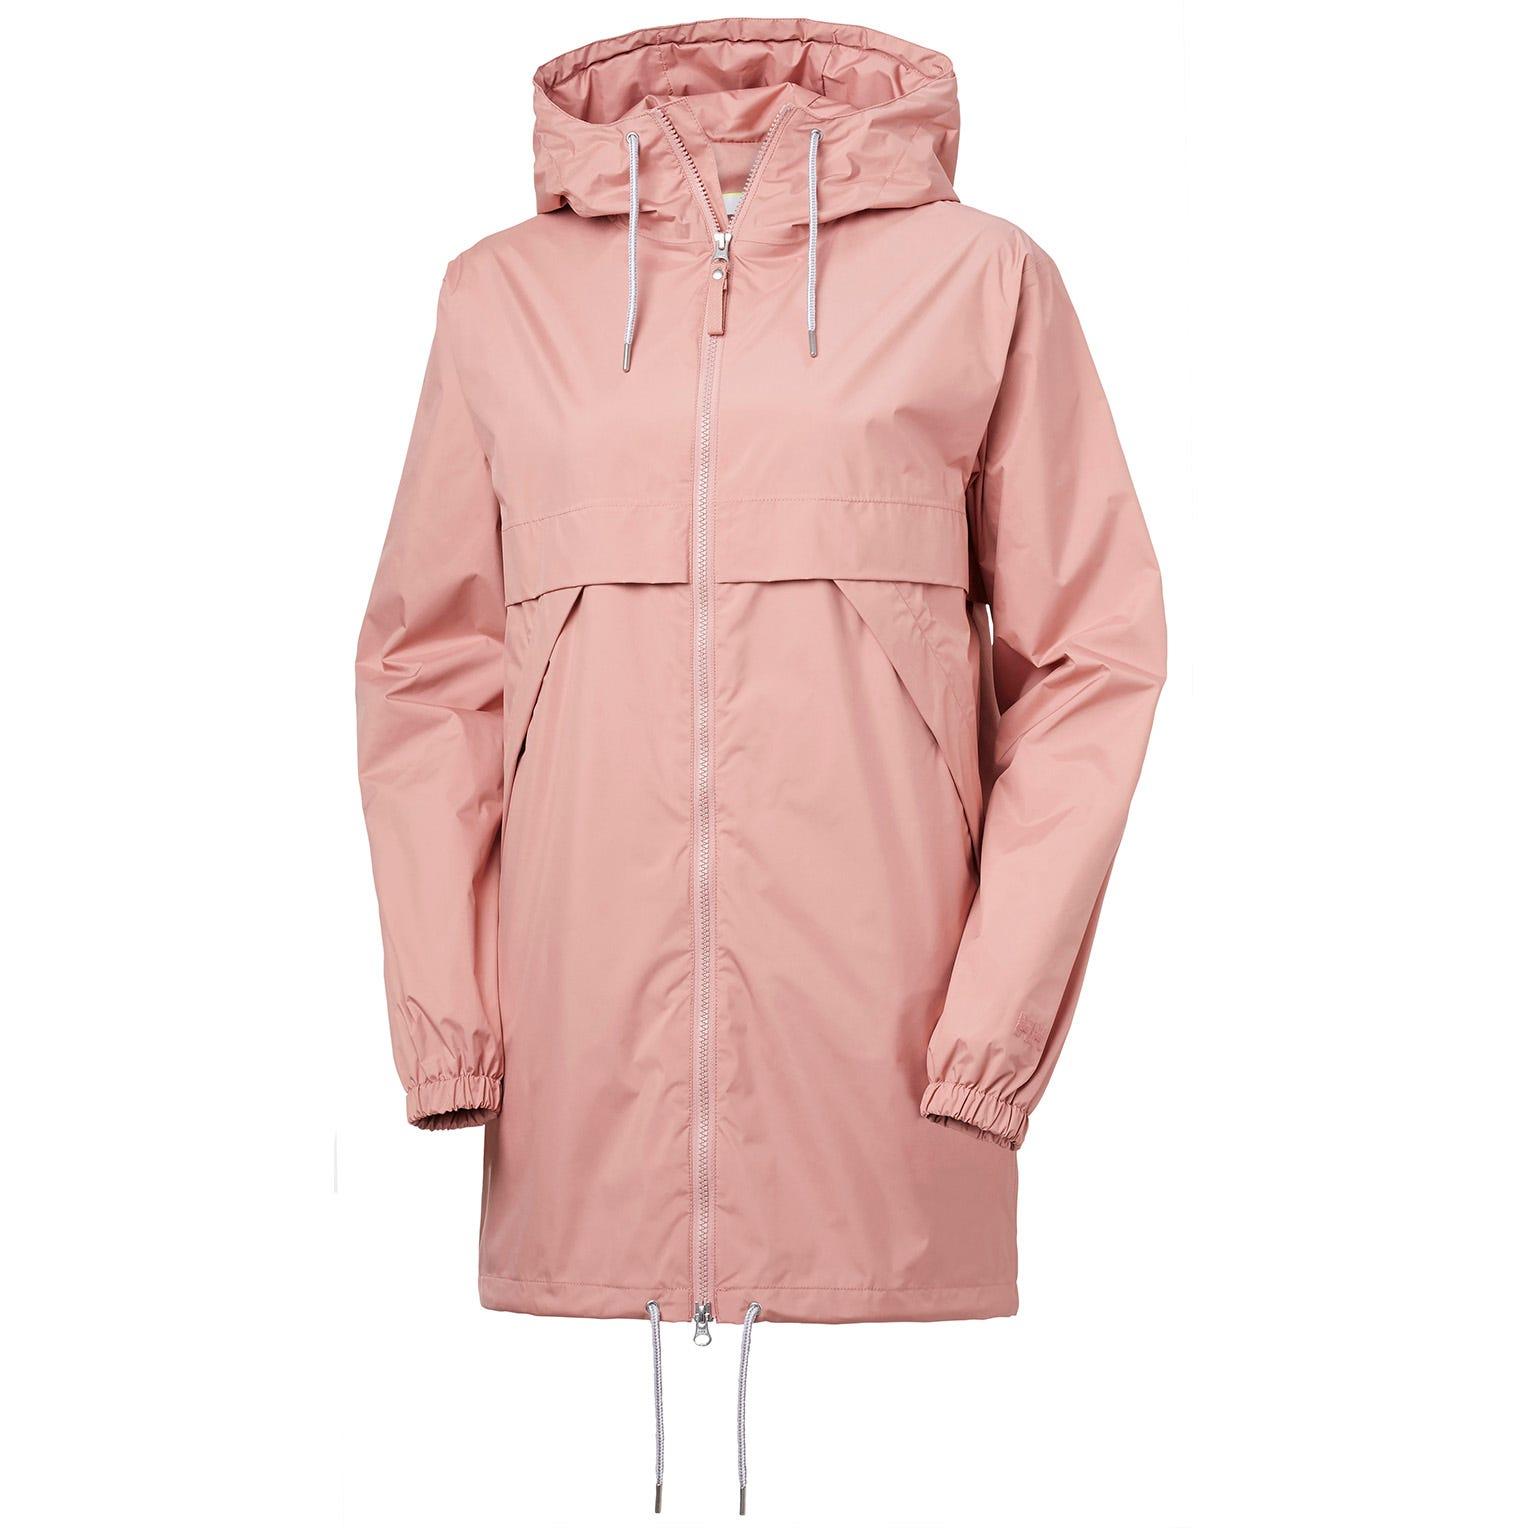 Helly Hansen Womens Jpn Raincoat Pink L